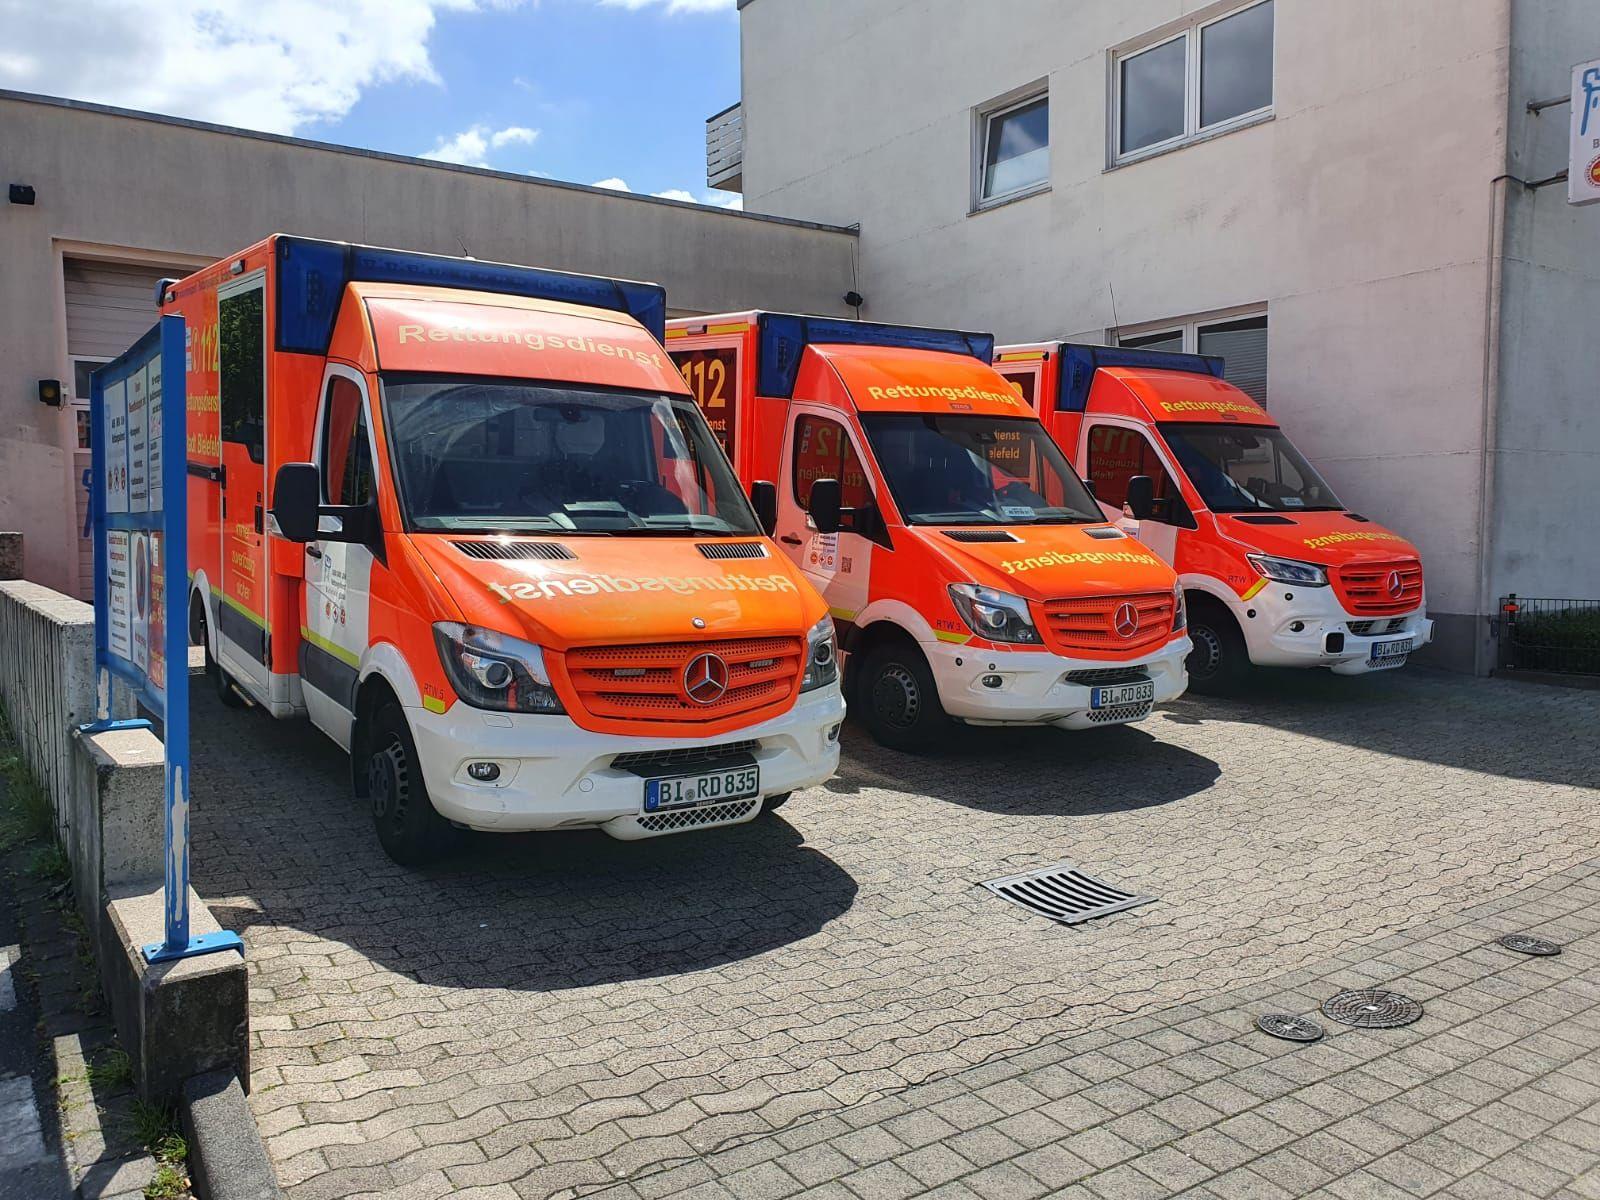 ASB DRK JUH Rettungsdienst Bielefeld gGmbH in